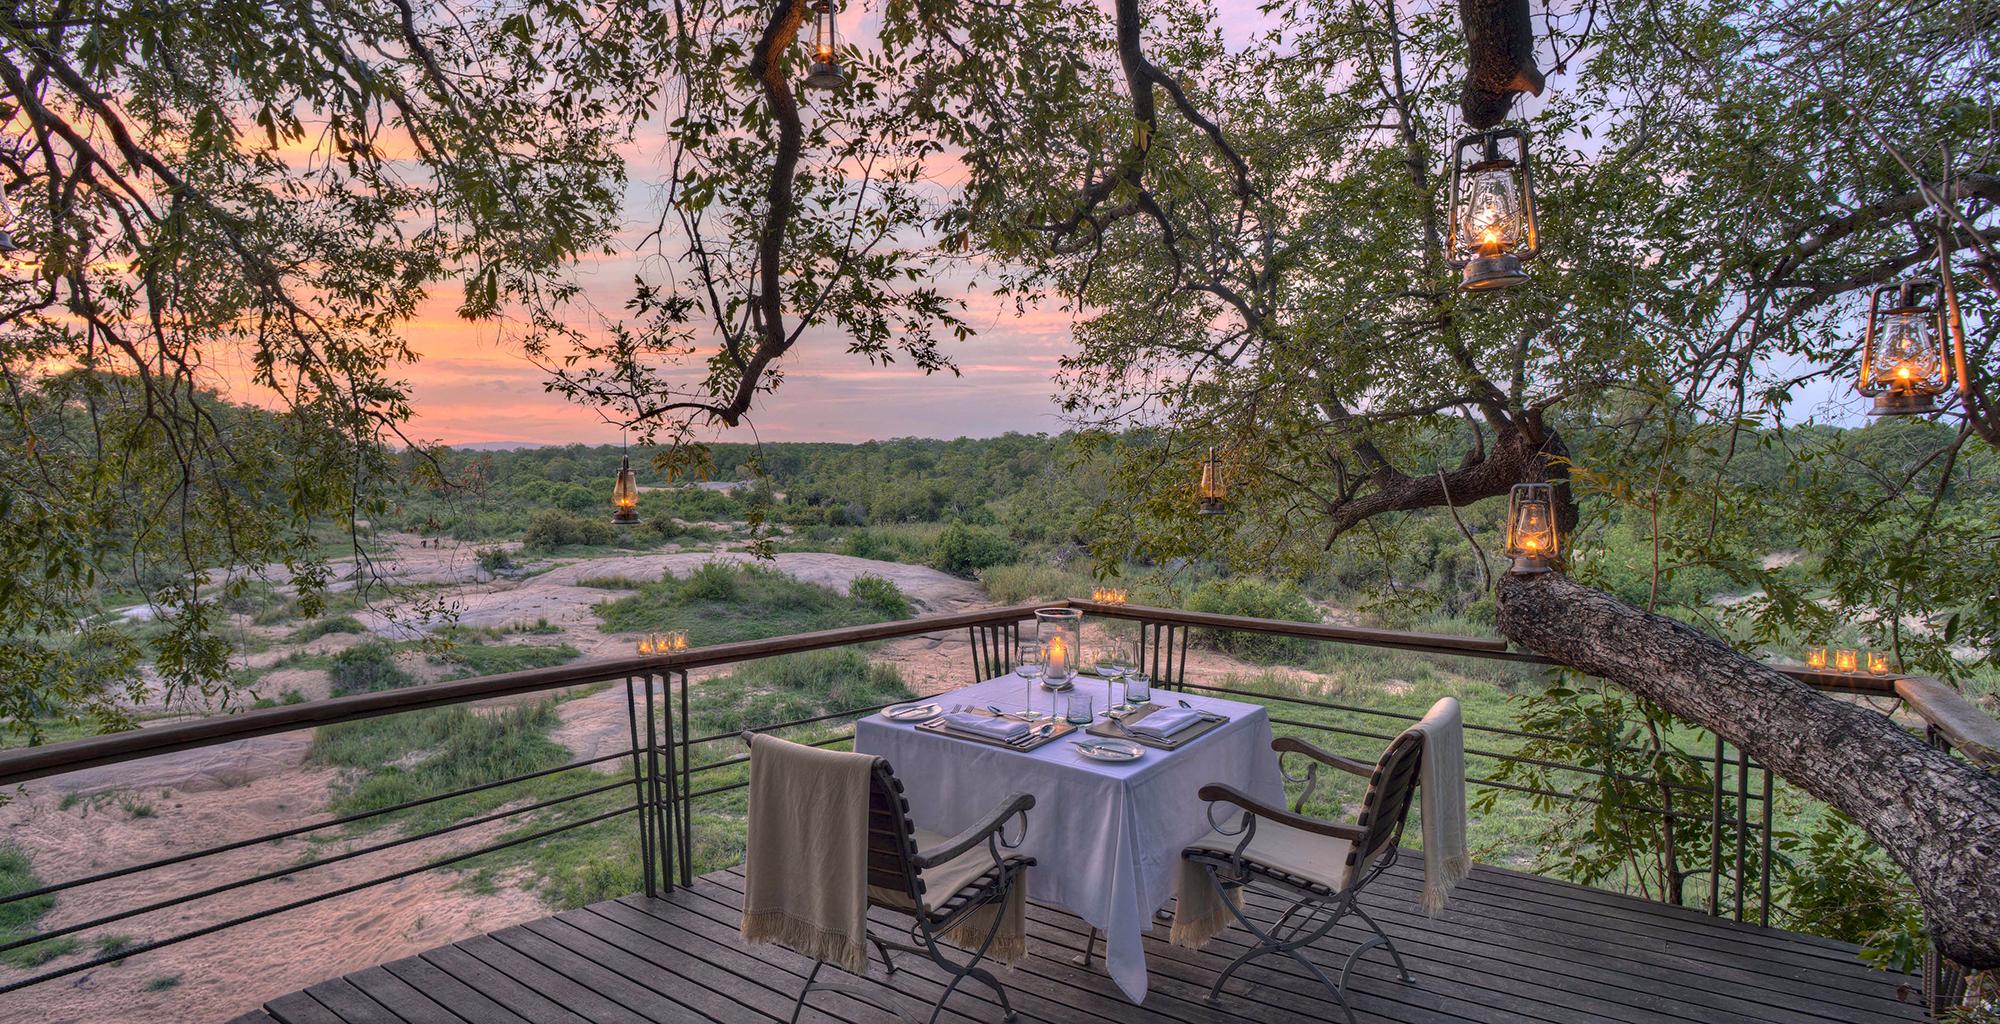 South-Africa-Dulini-Leadwood-Balcony-View